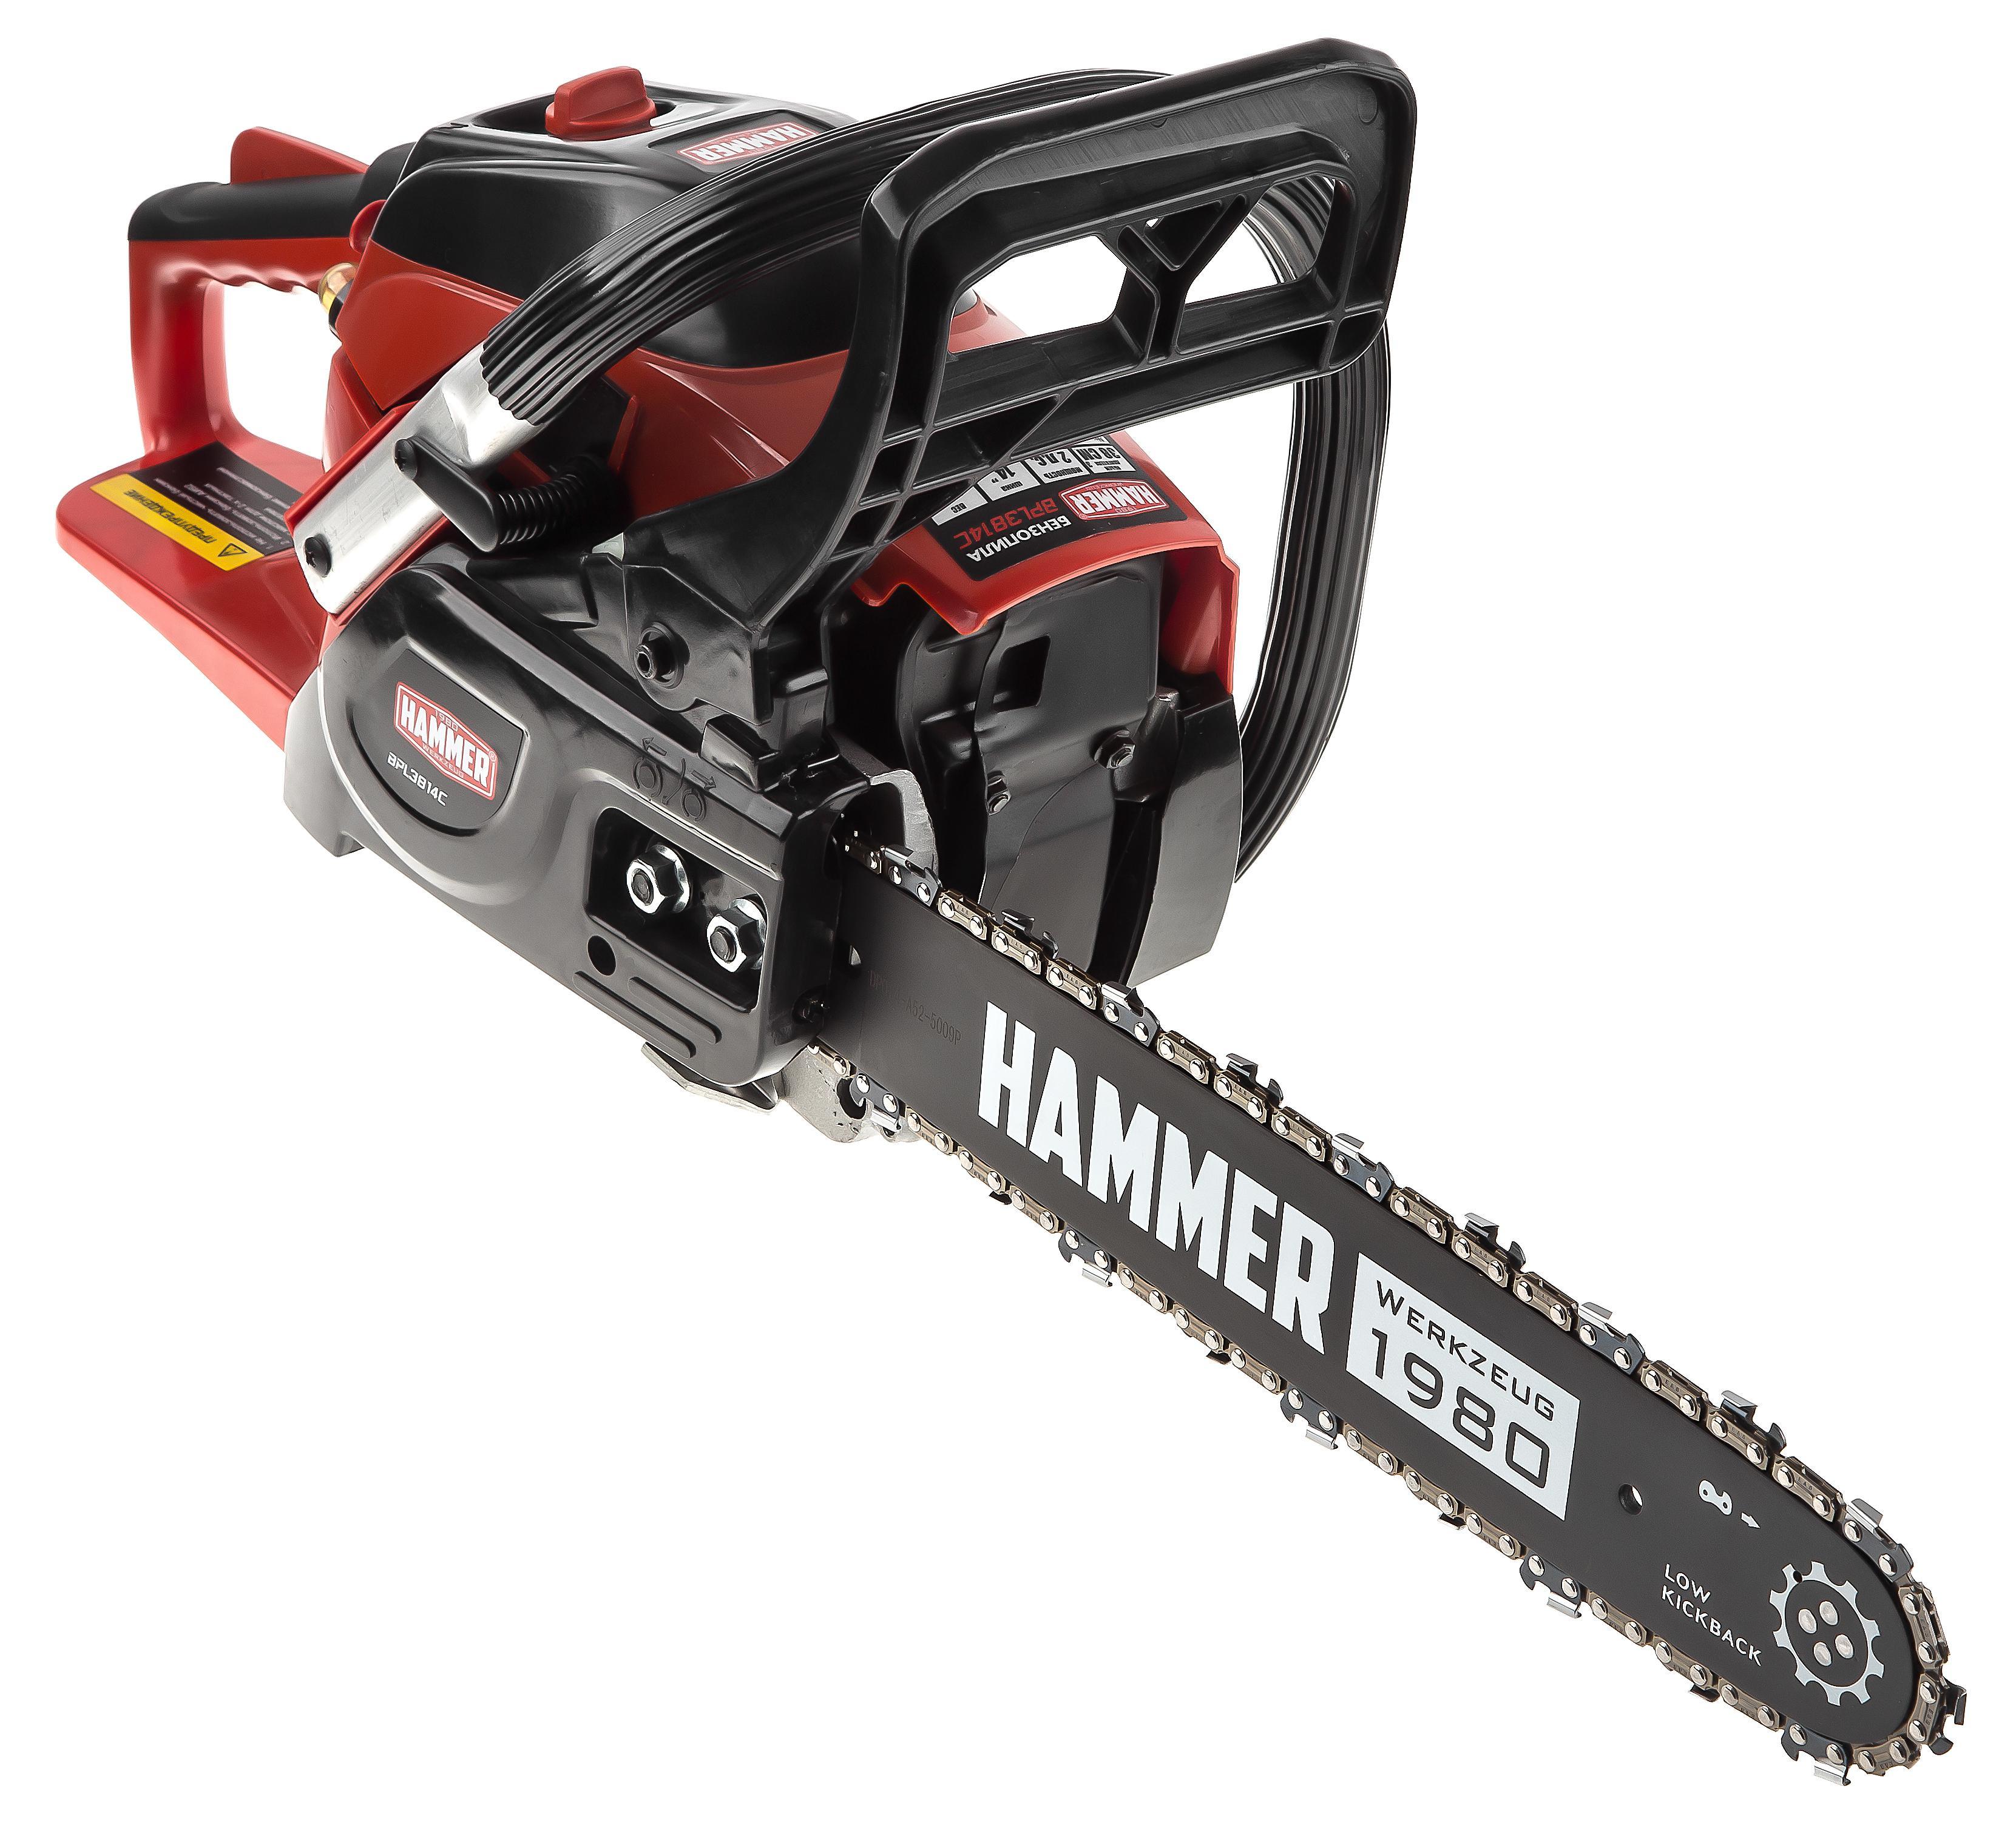 лучшая цена Бензопила Hammer Bpl3814c